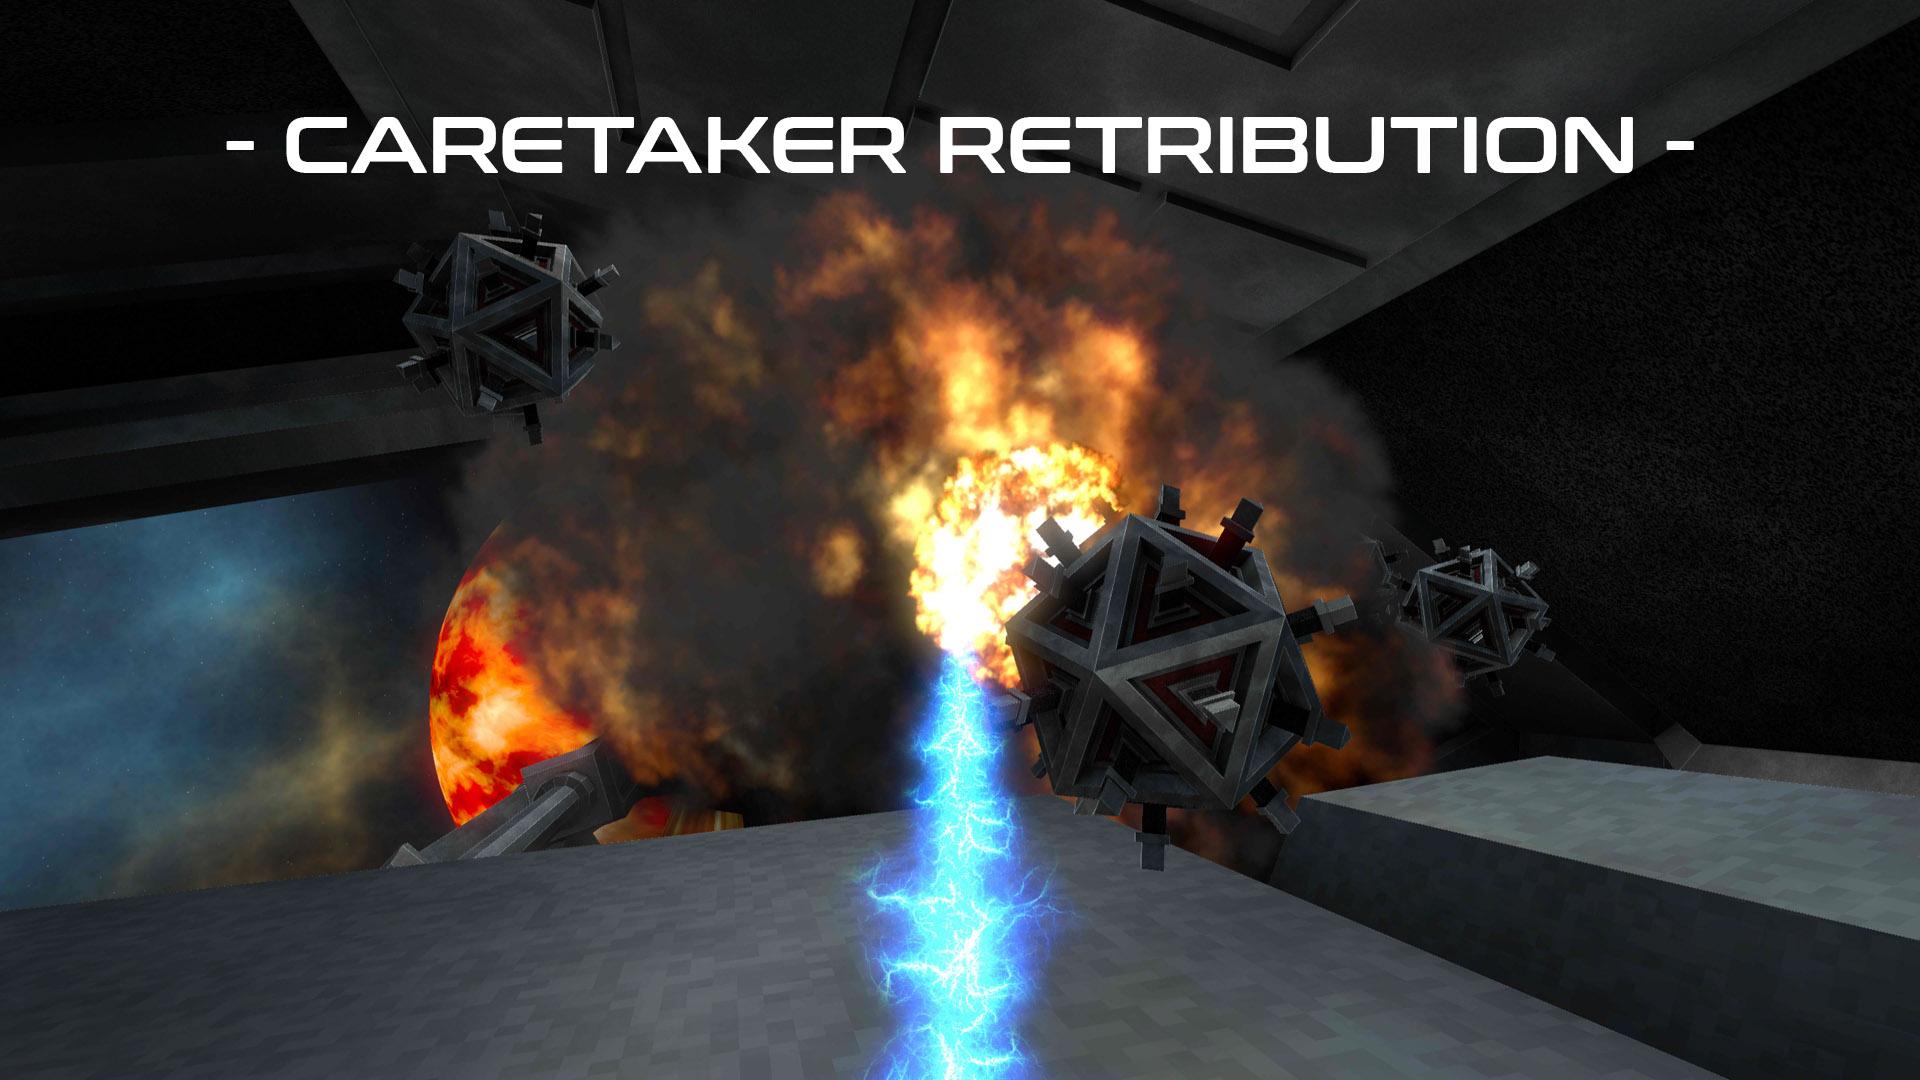 Caretaker Retribution